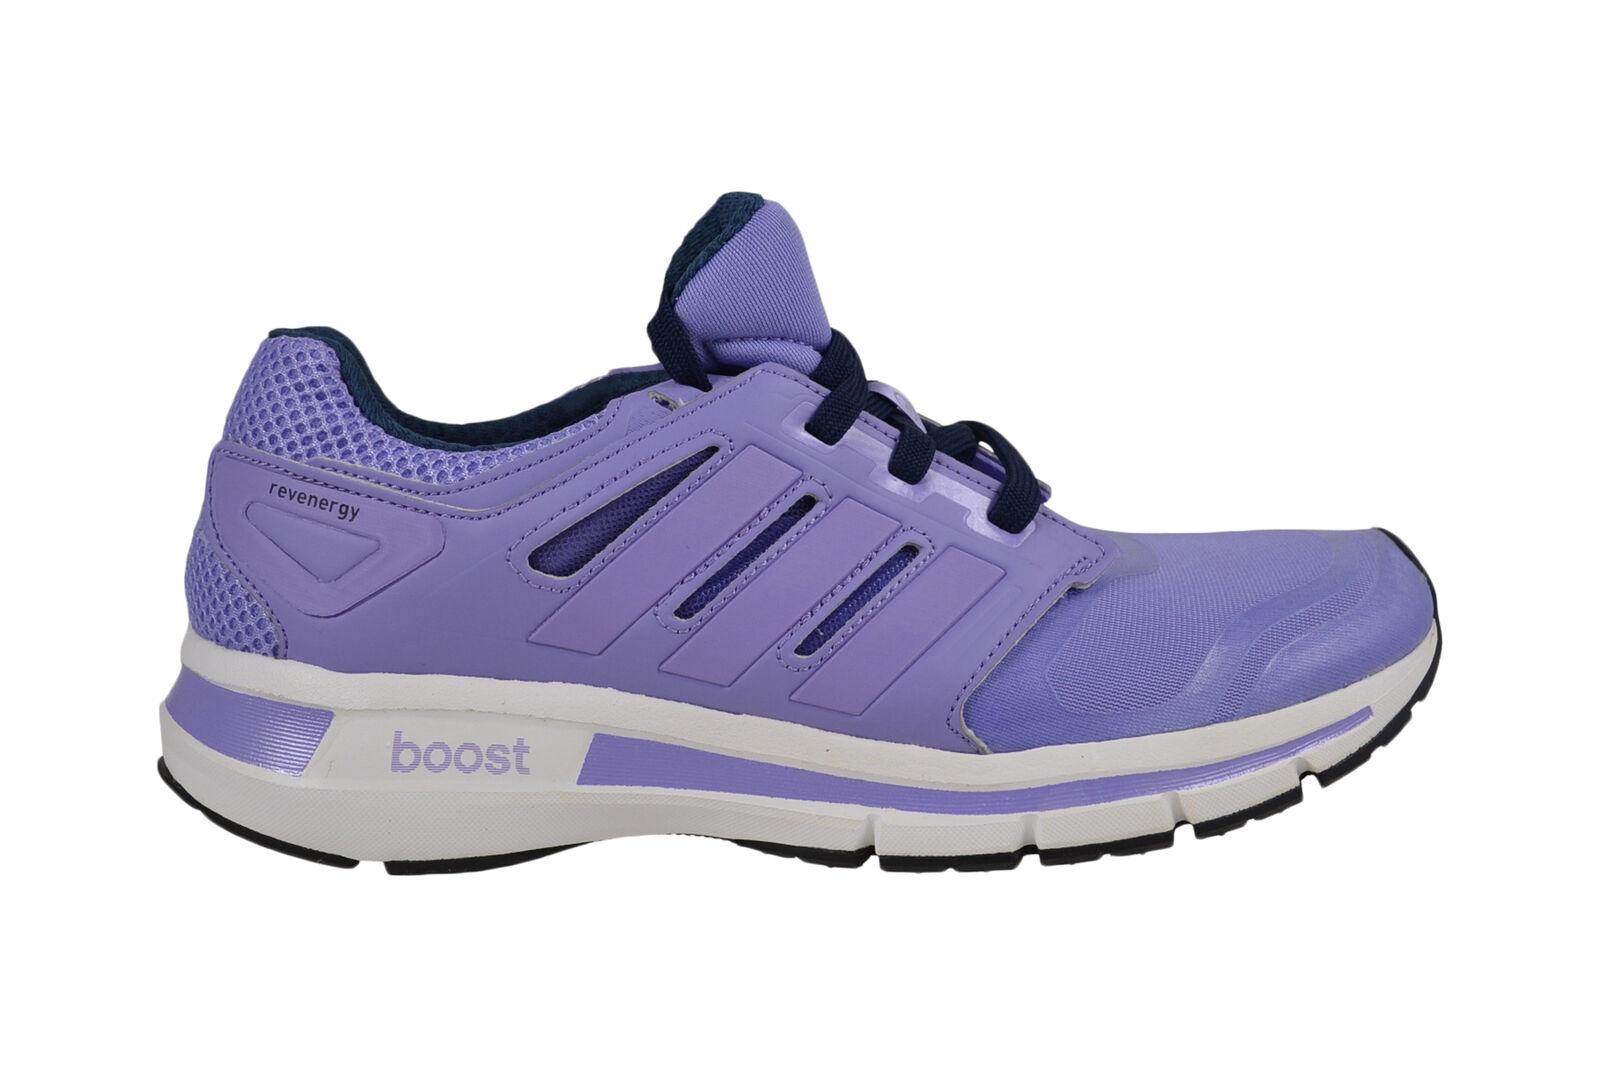 Adidas Revenergy Techfit W glow purple/WEISS Boost Laufschuhe M17441